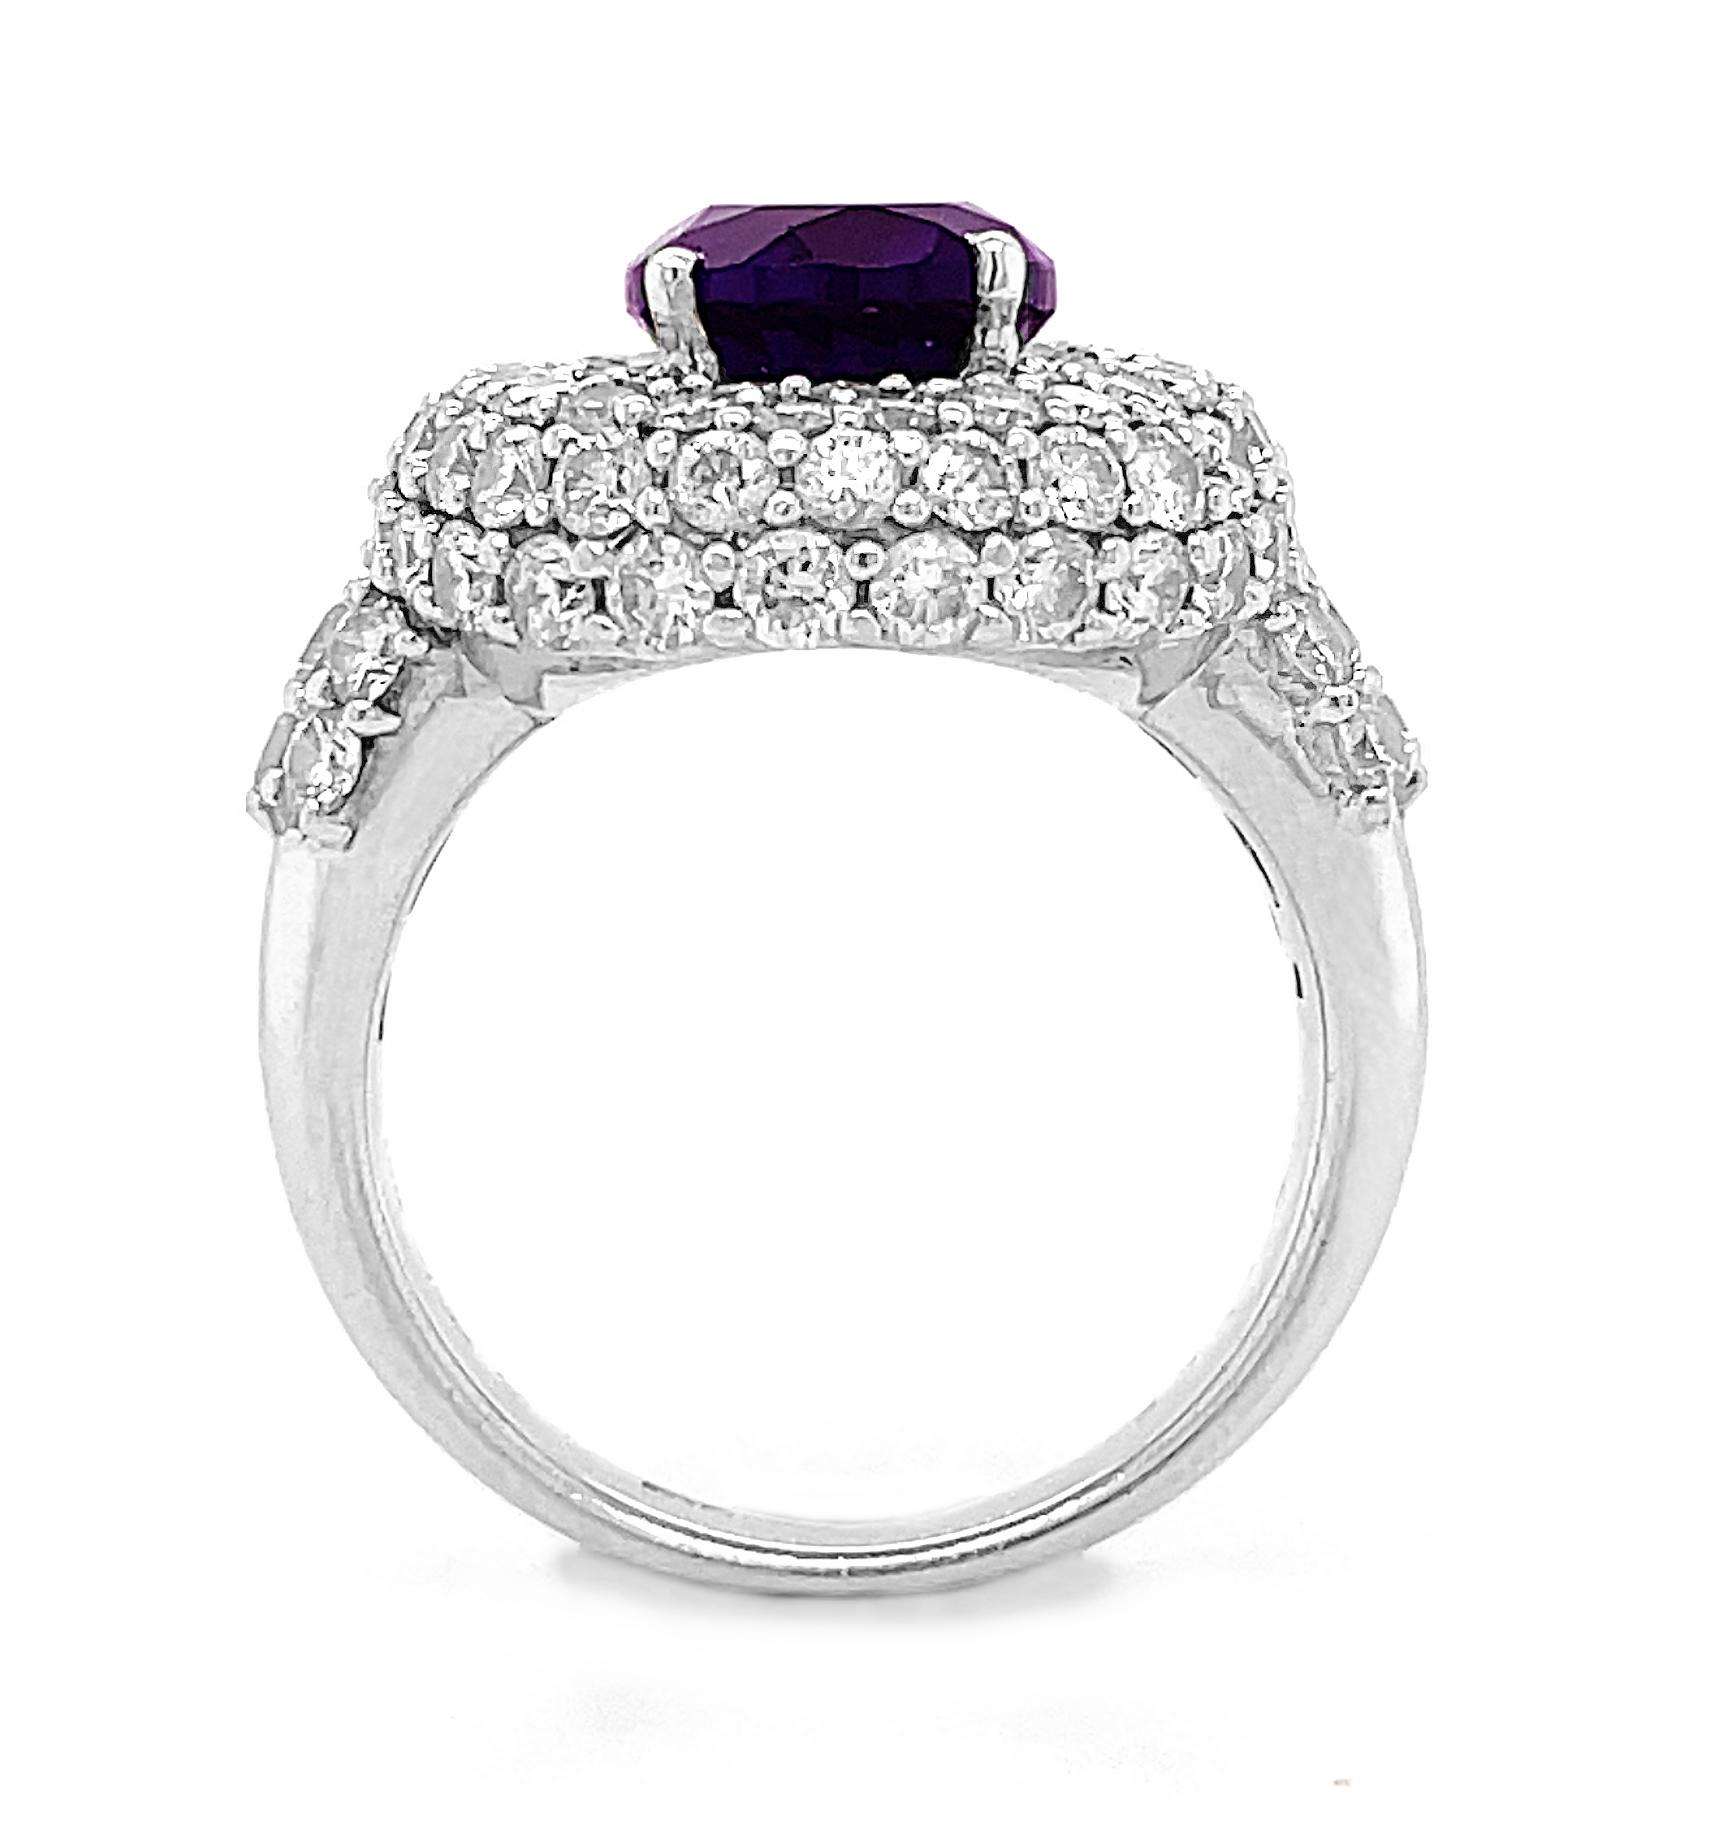 18k White Gold Oval Amethyst & Brilliant Cut Diamond Cluster Ring